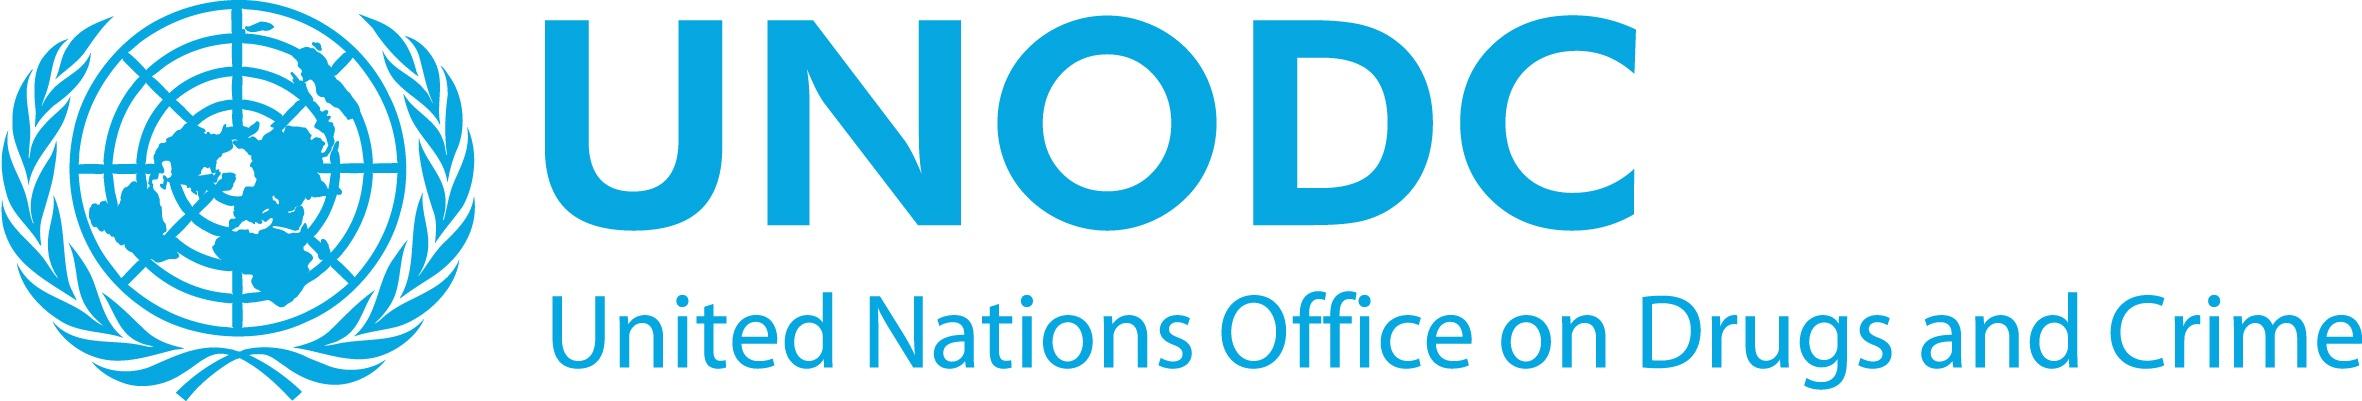 UNODC_logo_E_unblue1-(1).jpg